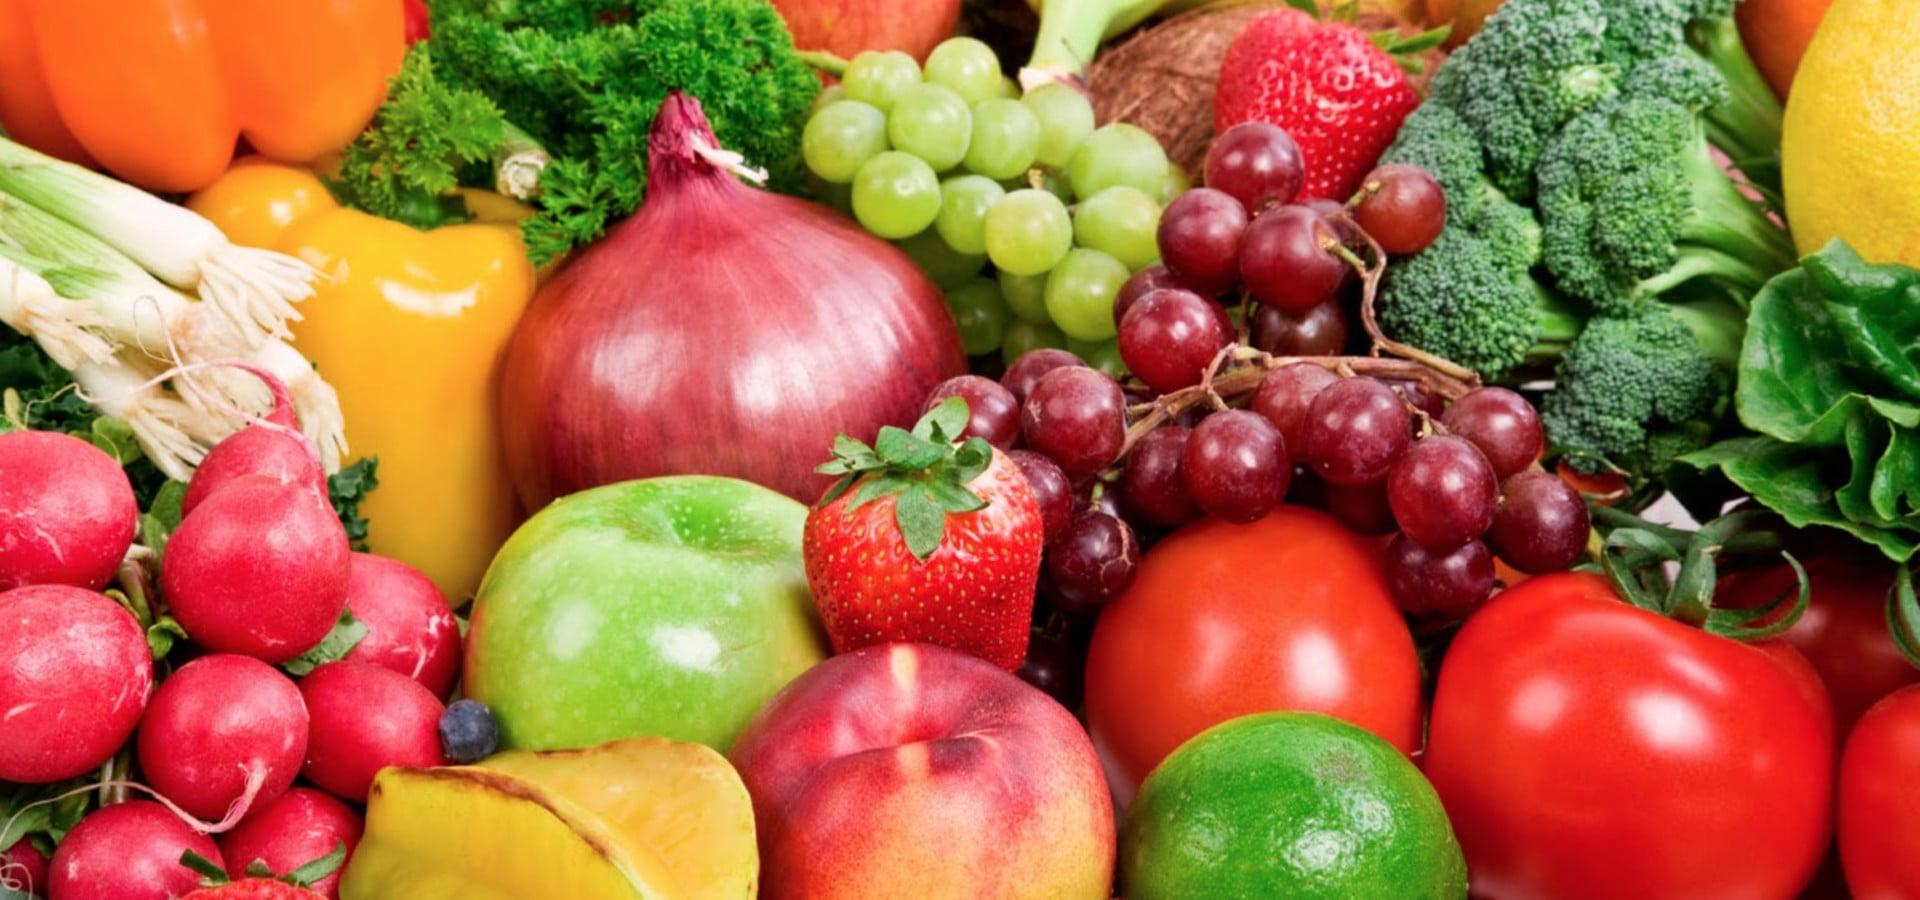 La Papaya Obst- und Gemüse